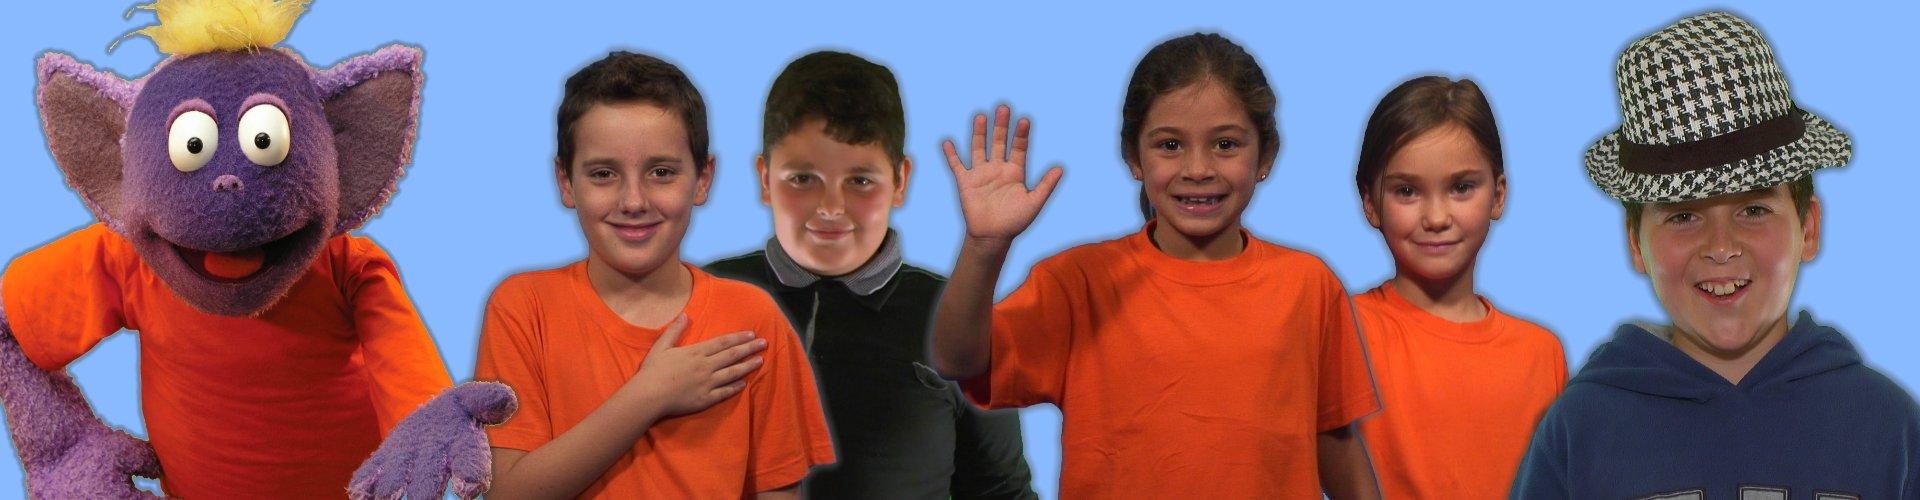 Spanish curriculum for KS1 & KS2 (UK) and 1st-5th Grade (US)